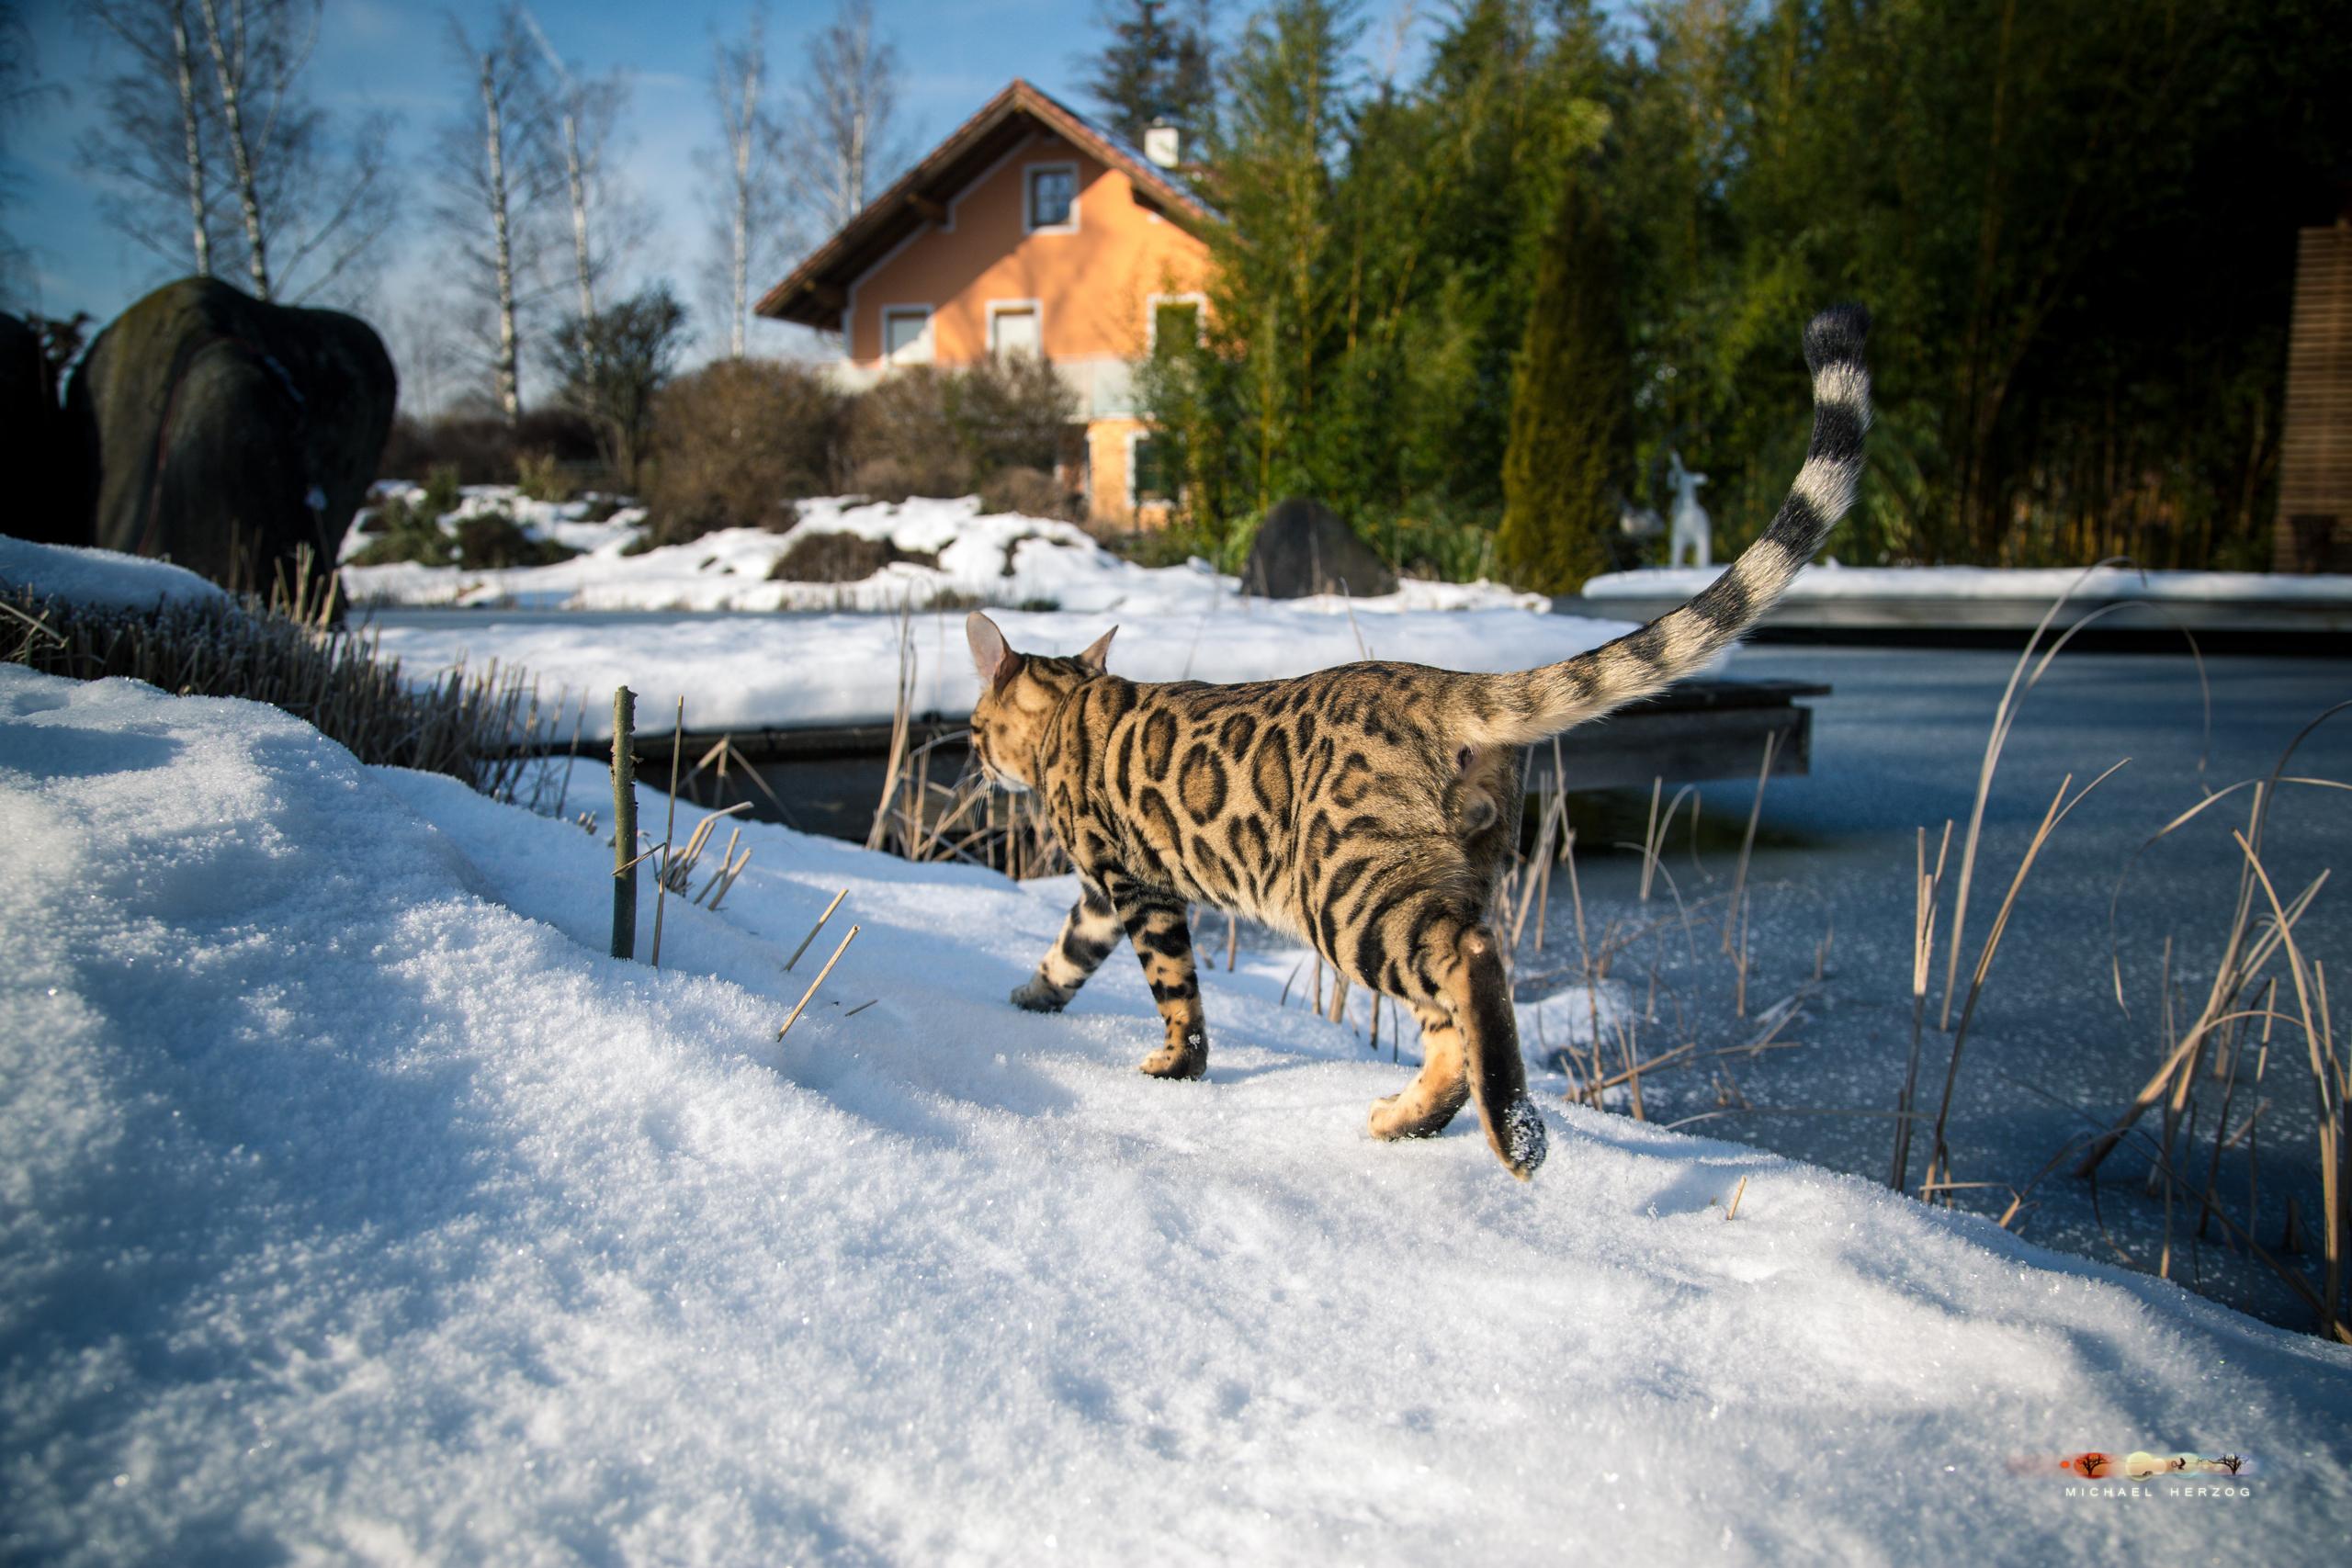 BALUARI_Winter2019_Garten_MichaelHerzog-8507.jpg